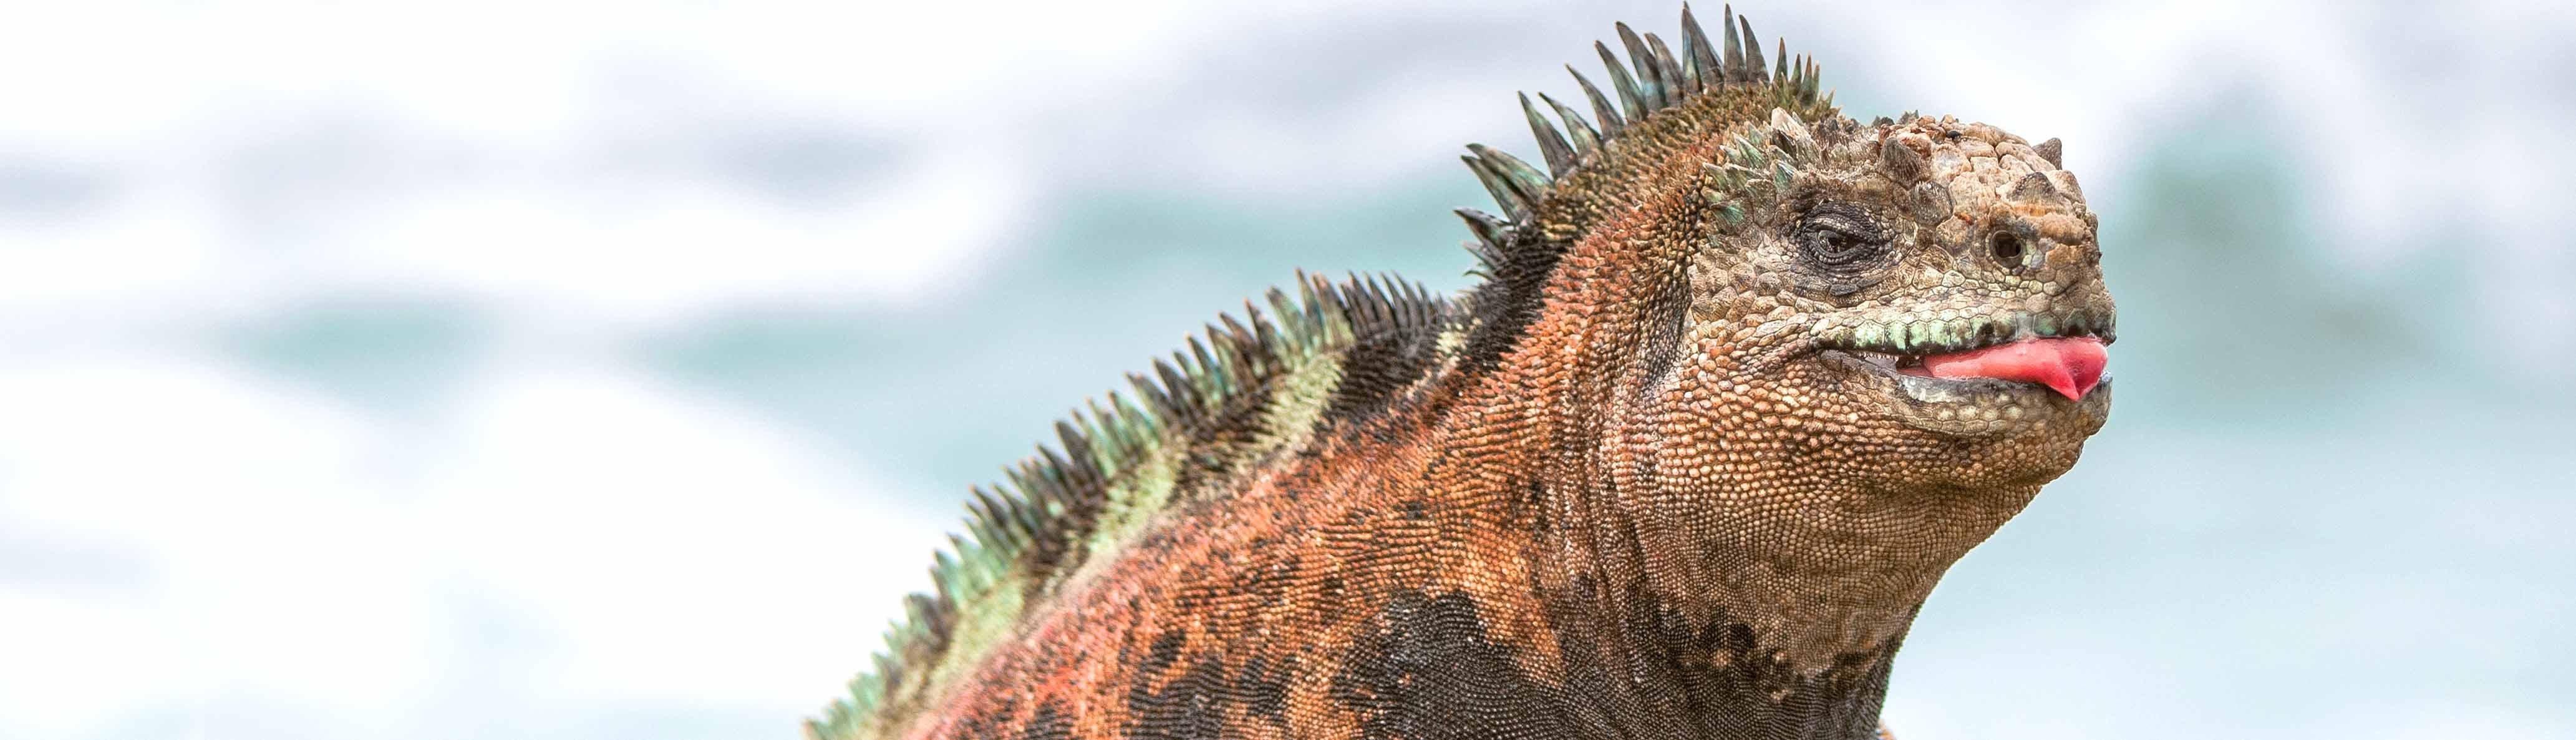 Galapagos Explorer: Southern Islands (Grand Queen Beatriz)